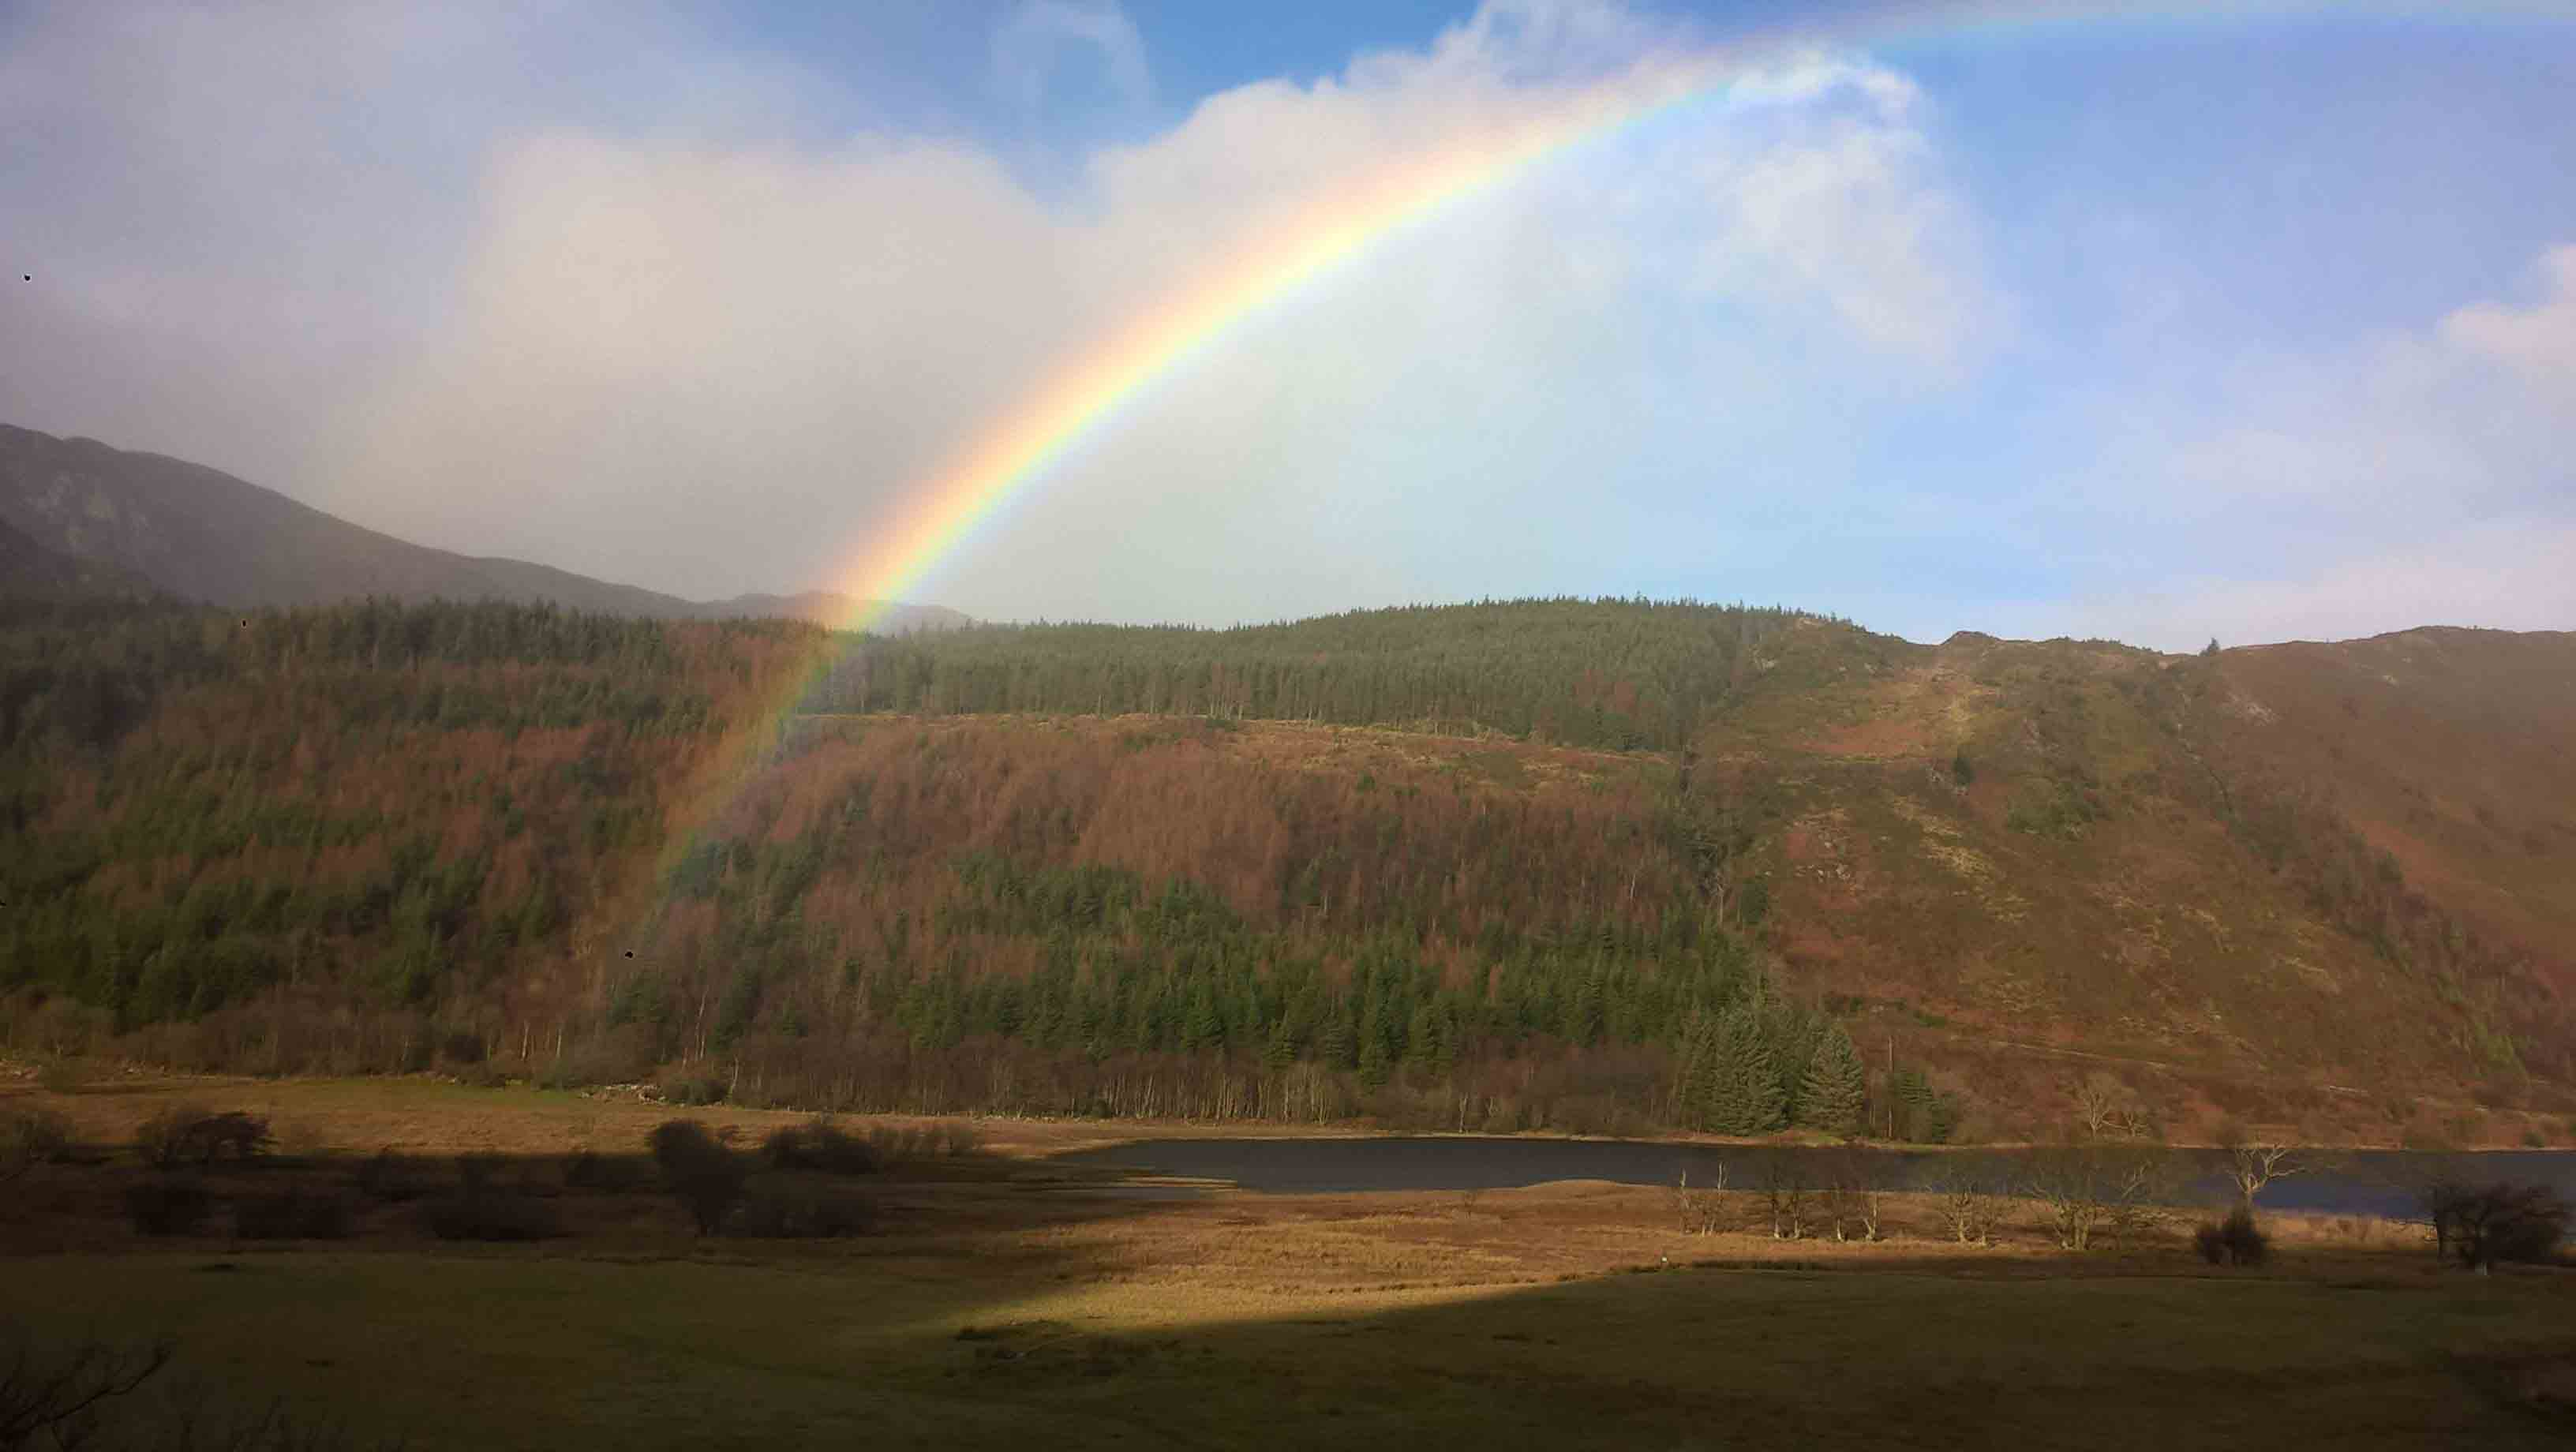 Rainbow above Llyn Crafnant